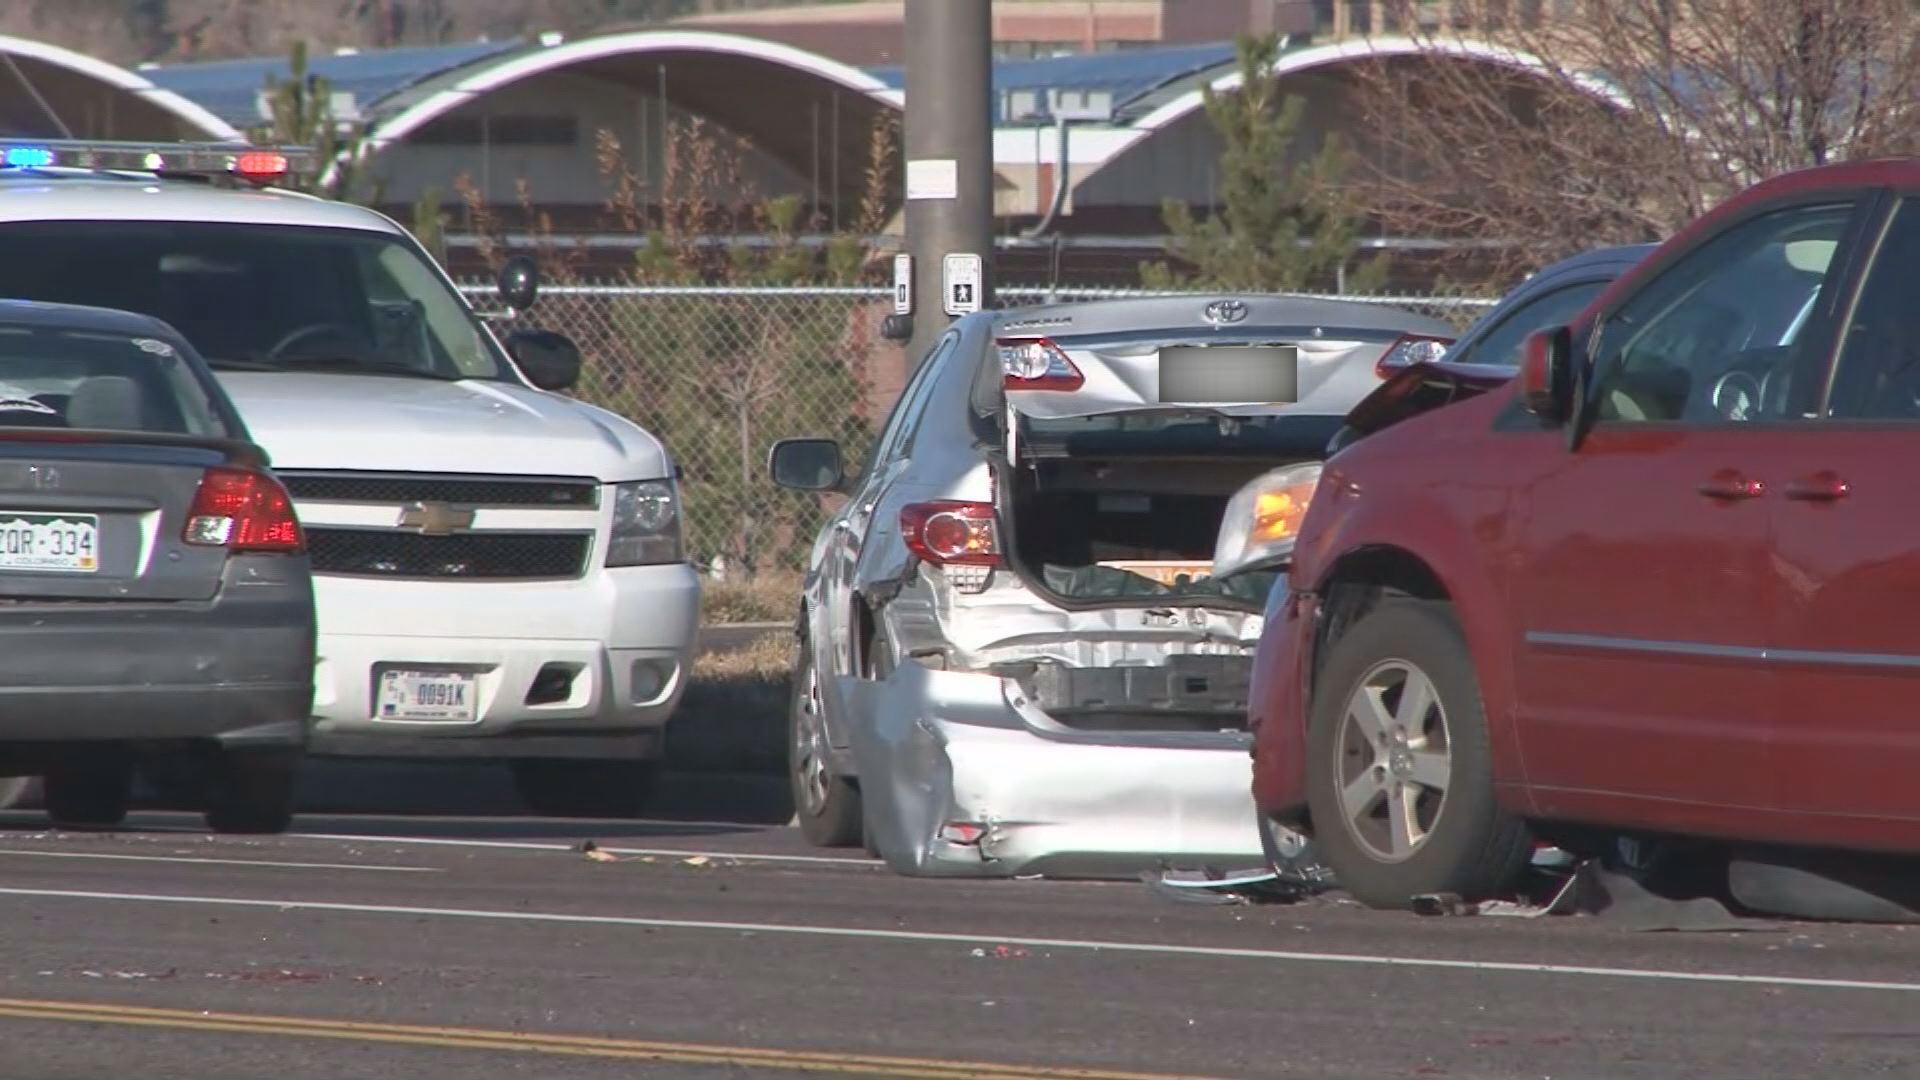 2 Men Killed, 2 Women Injured In Crash Near Sedro Woolley